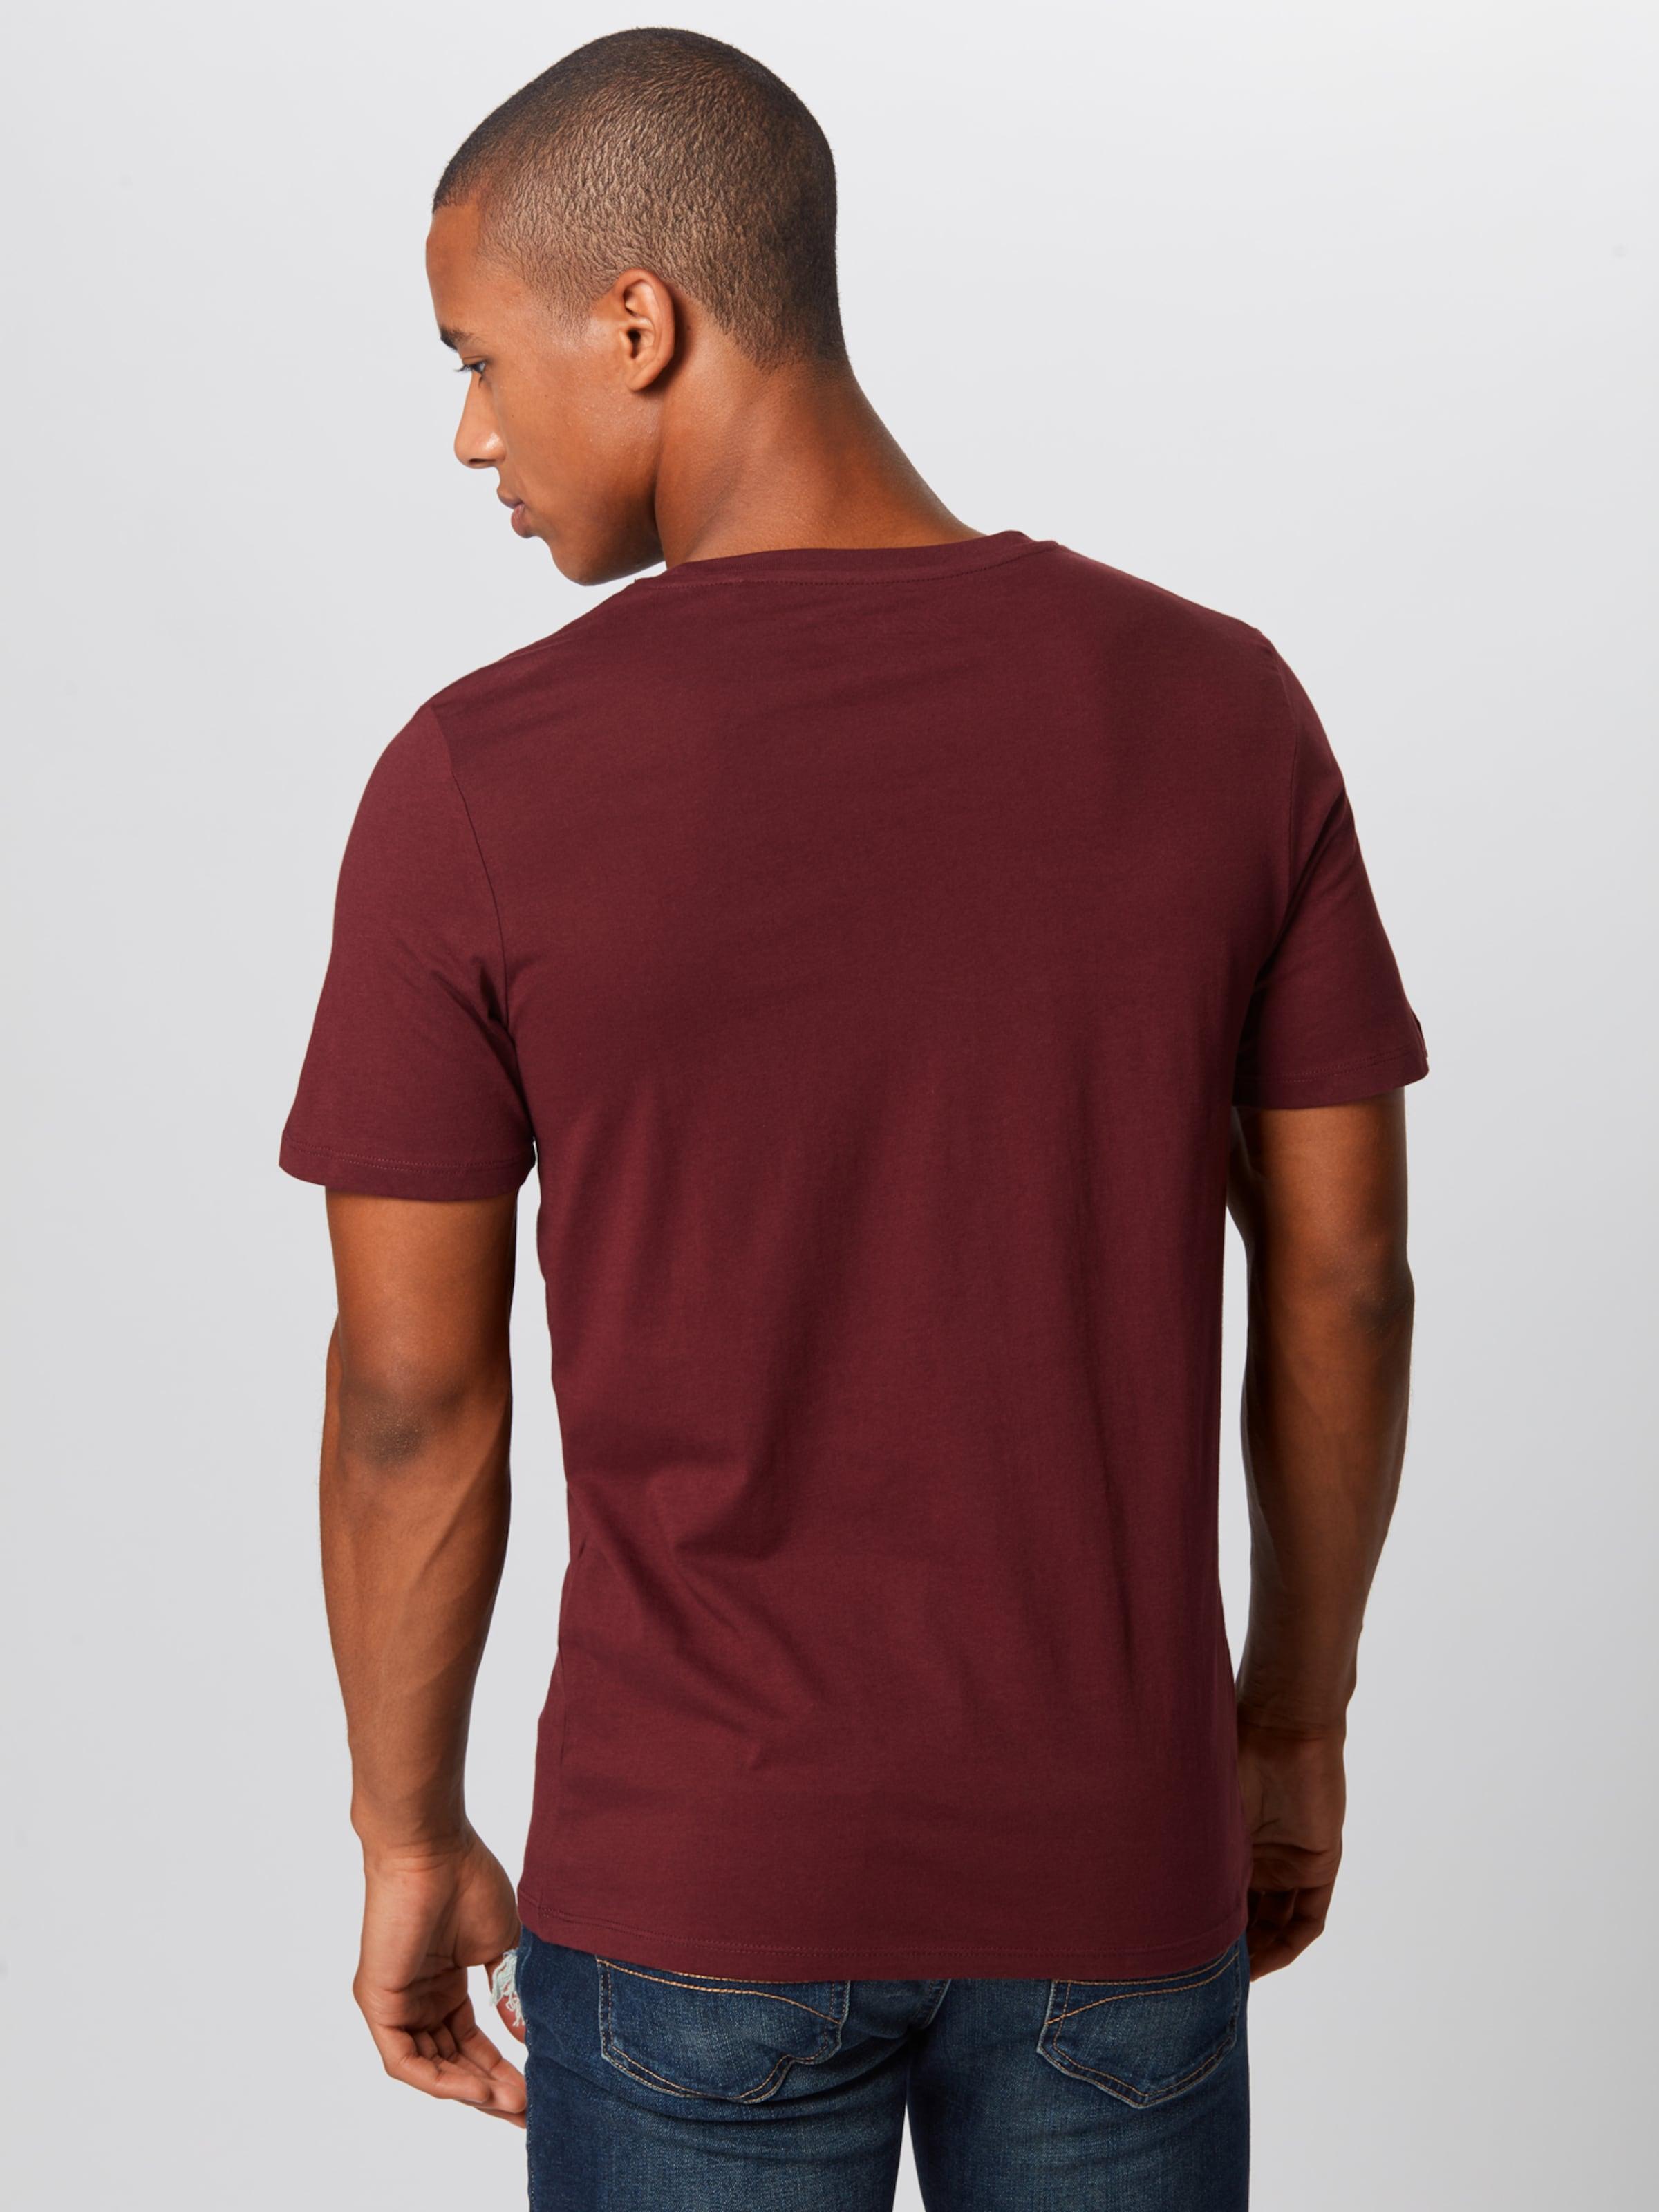 In Jackamp; Weinrot Jones 'logo' Shirt Y7g6ymIvbf